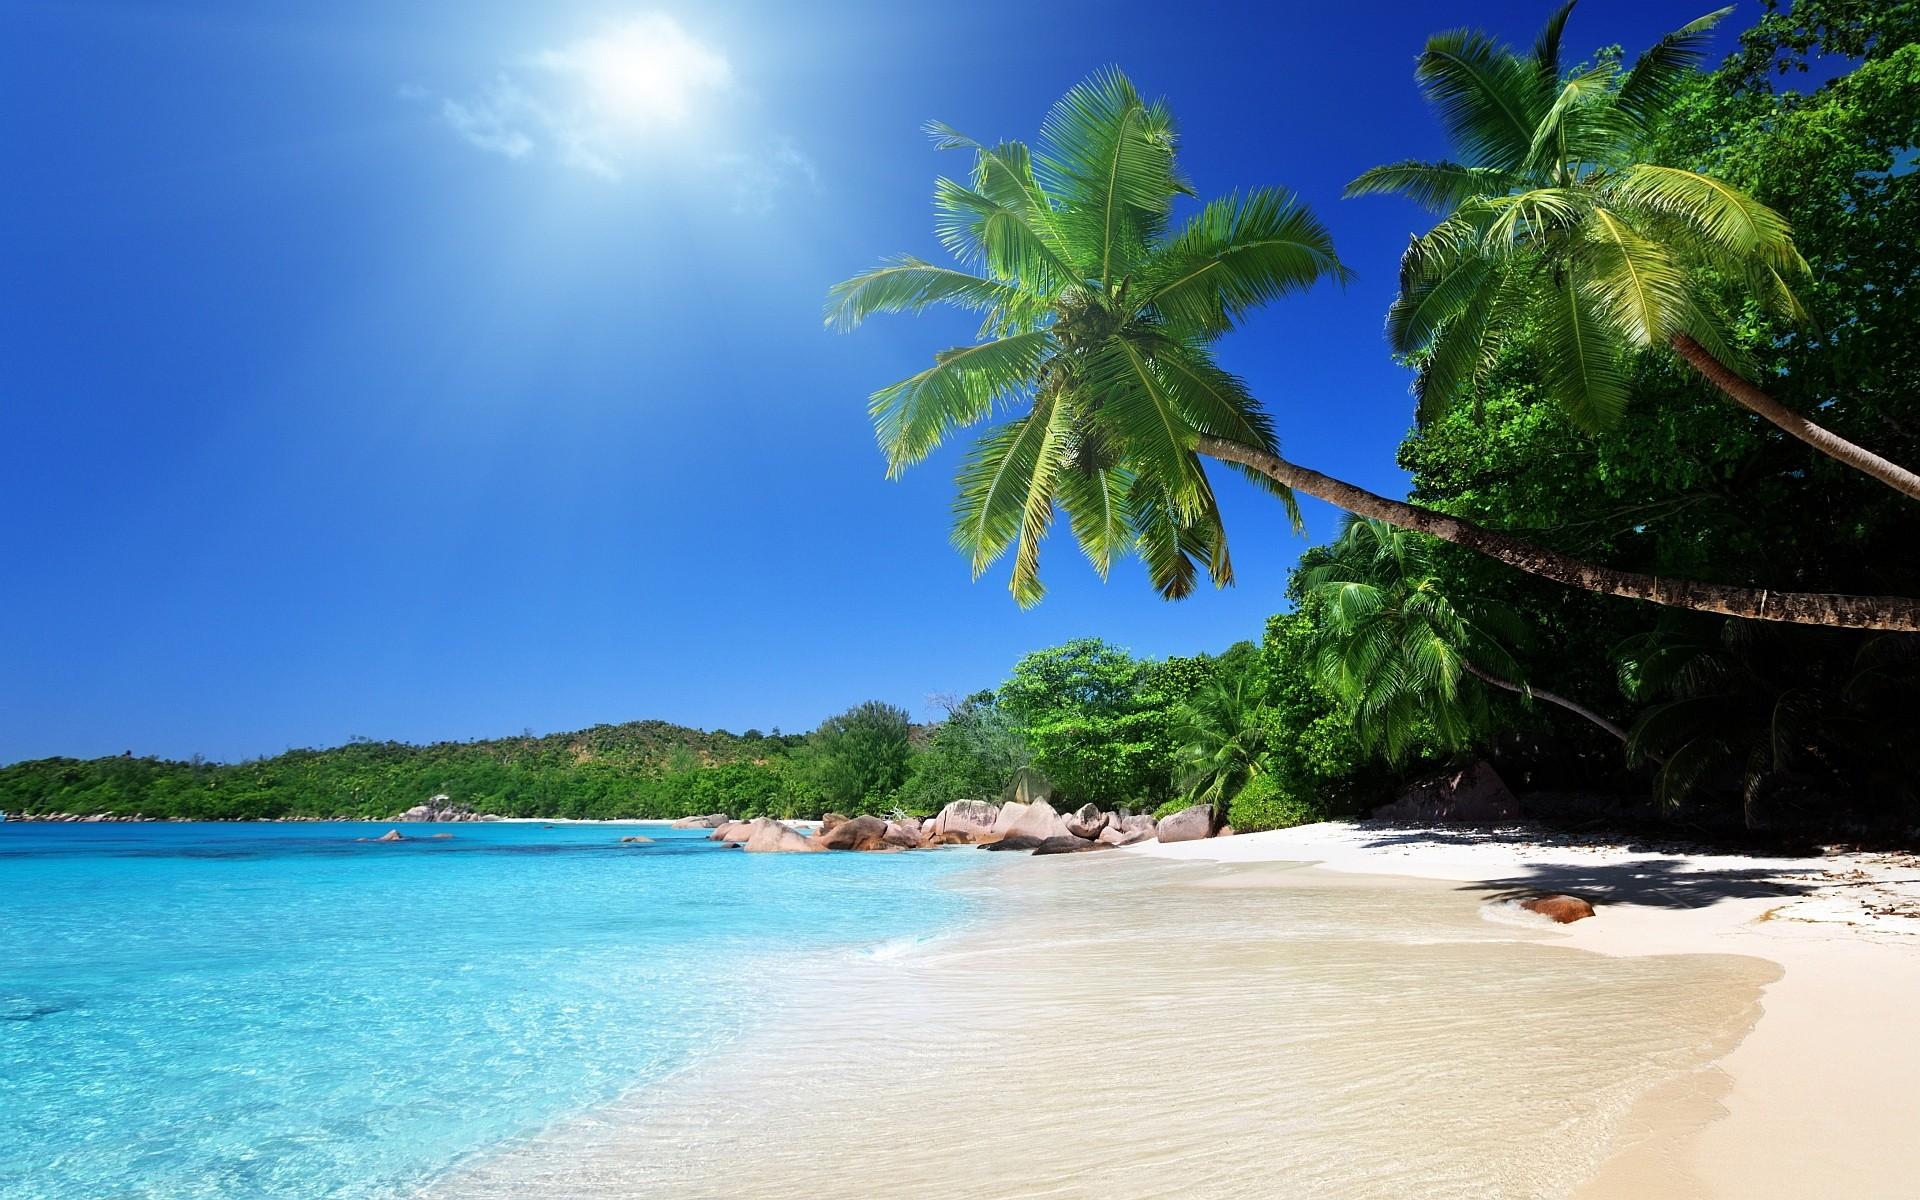 sunshine beautiful beach image. high resolution beautiful beach background